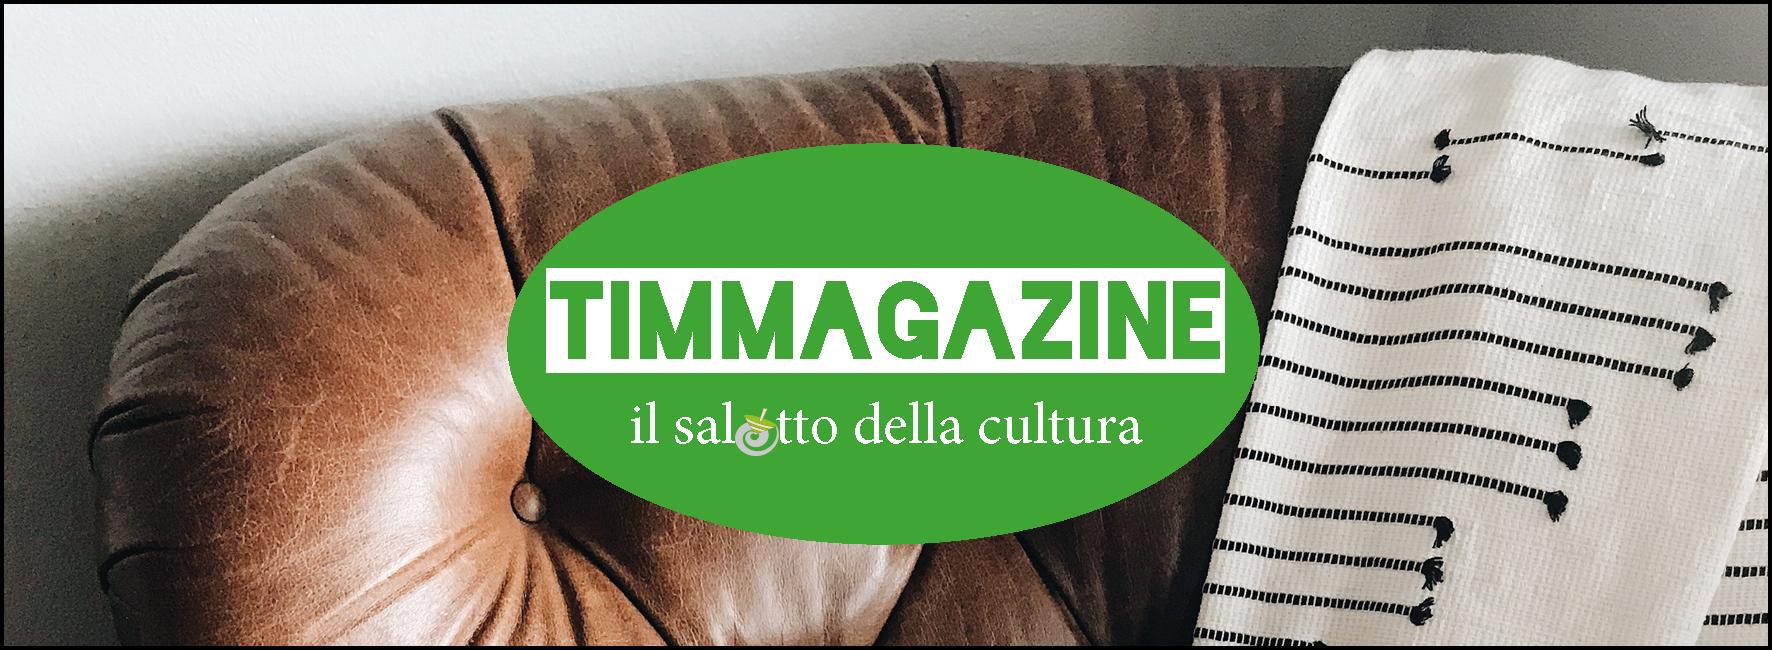 timmagazine-slide-2017